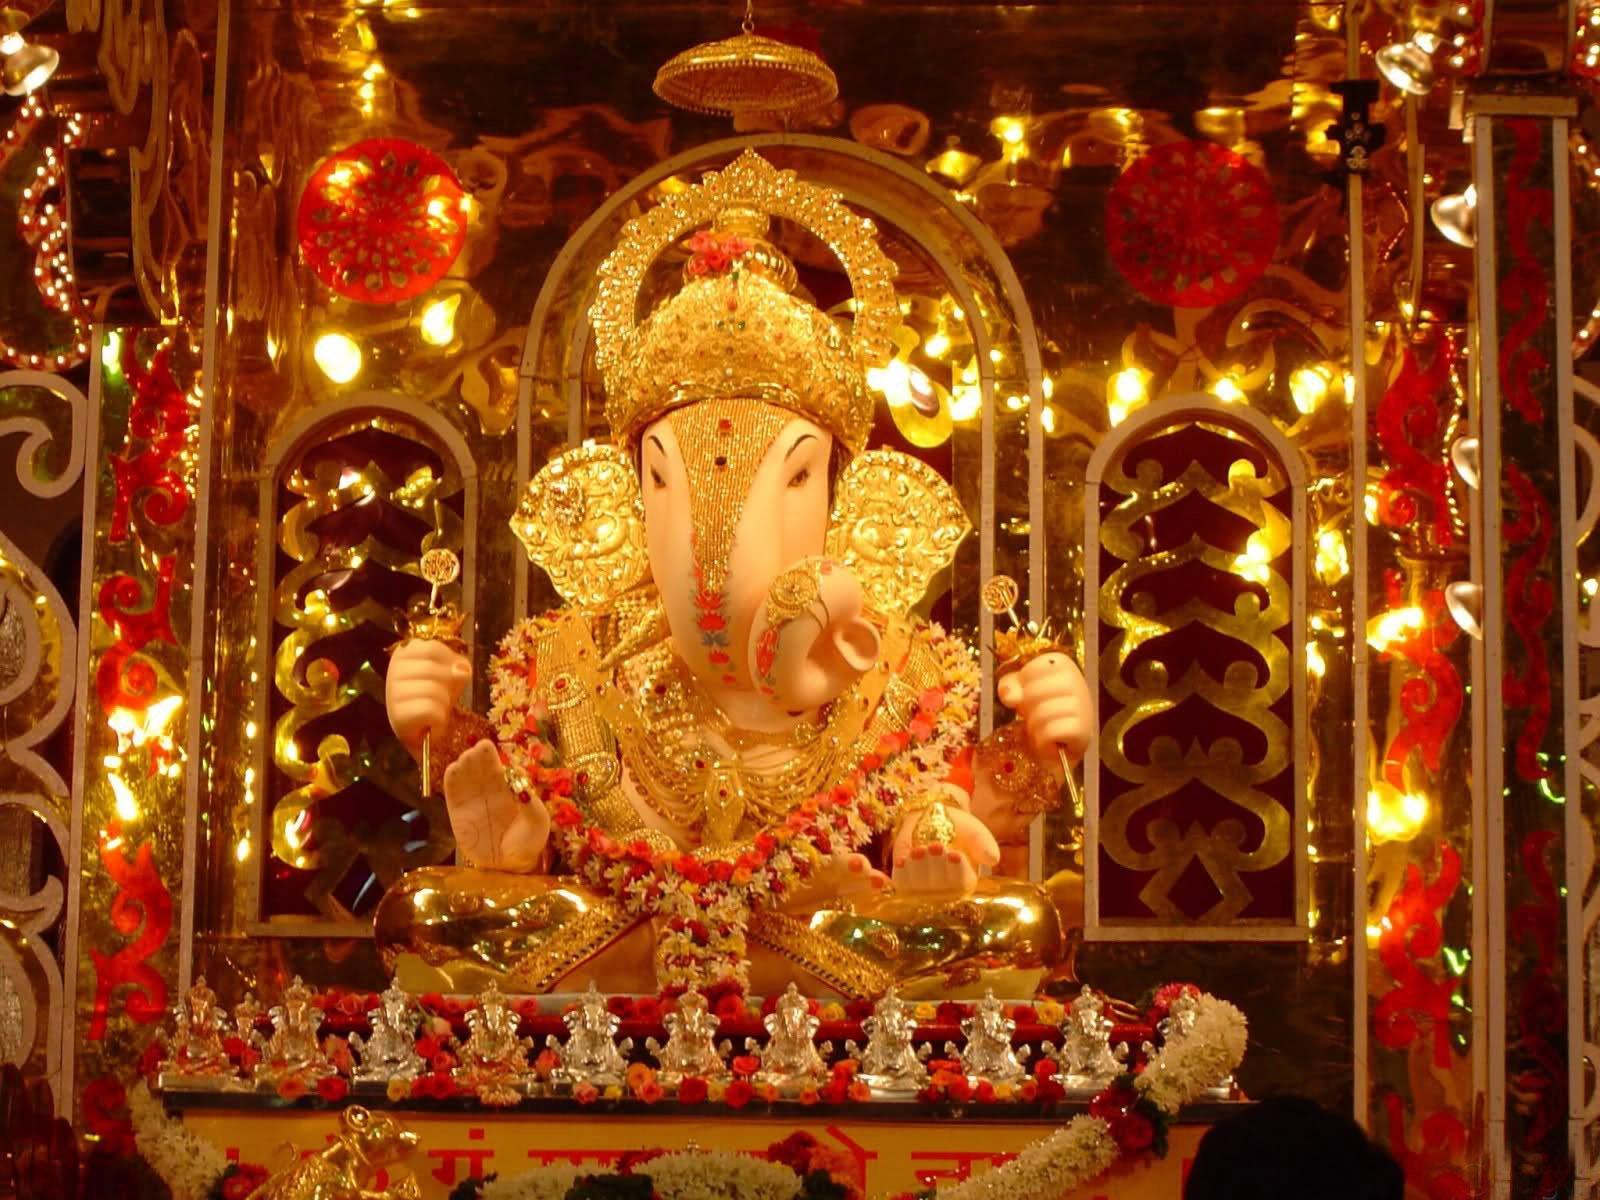 Hd wallpaper ganesh ji - Of September 2013 Lord Ganesha Also Known As Ganesh Ganesh Ji Ganpati